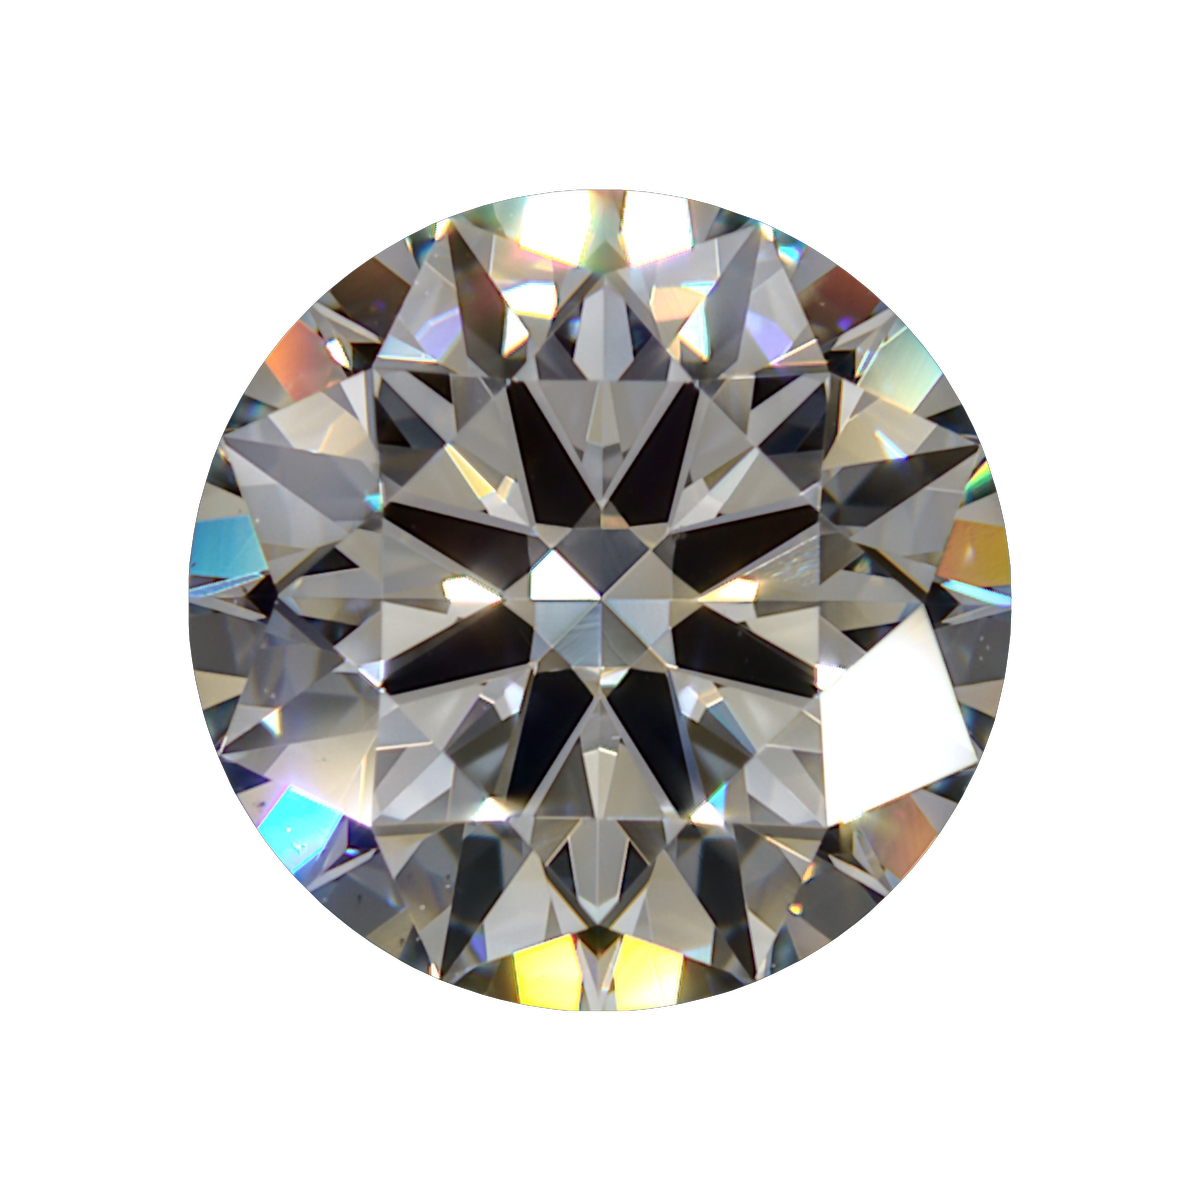 https://cdn.briangavindiamonds.com/files/mp4/BKAGS-104100413010/BKAGS-104100413010-Fire-02.mp4